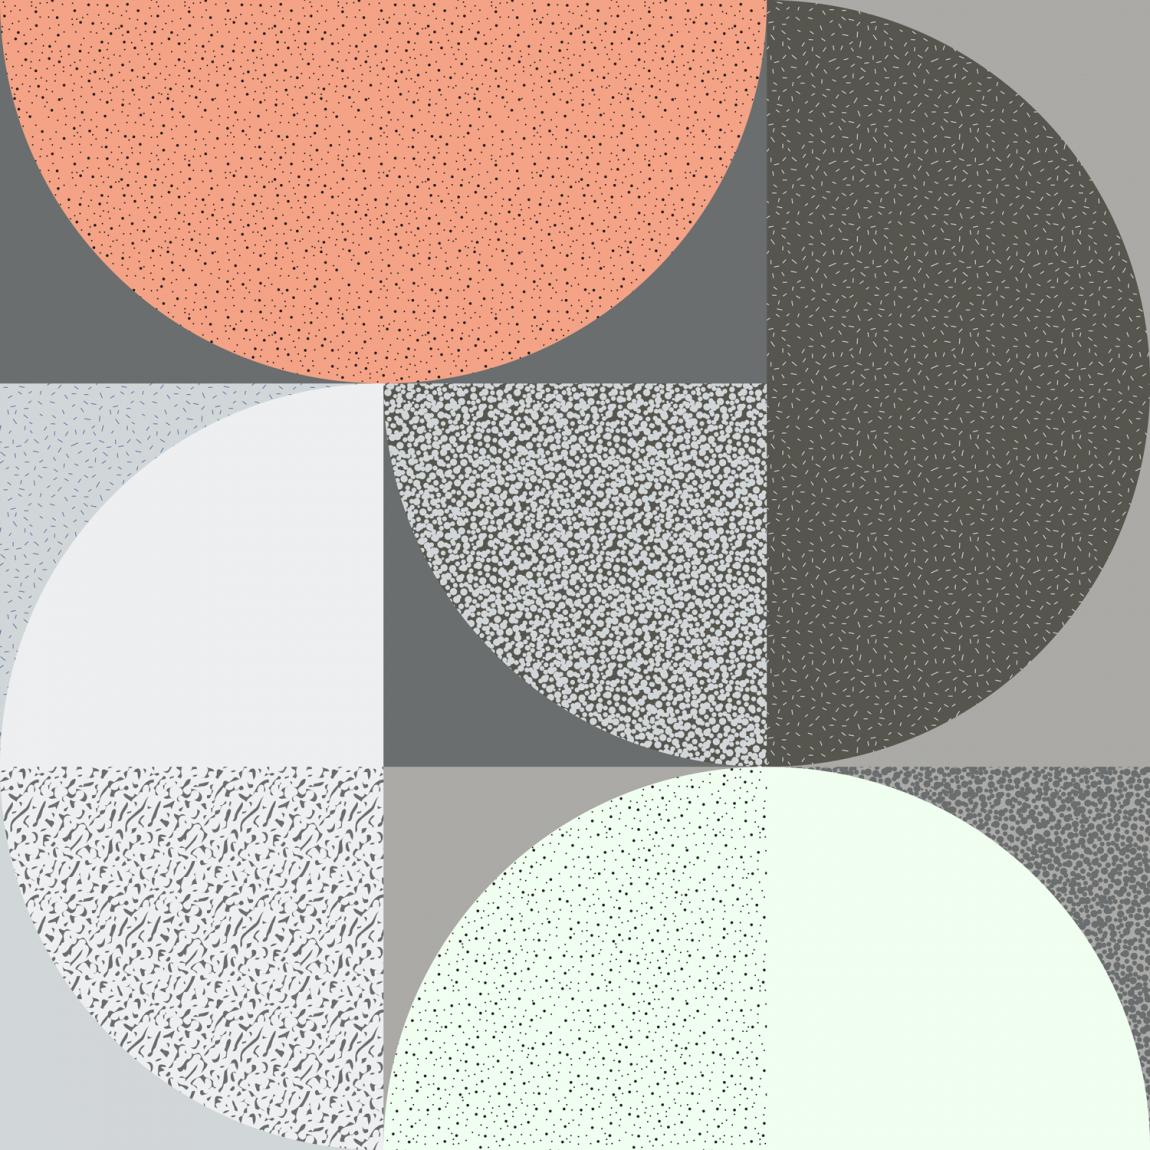 Elements产品整体形象设计,图形设计